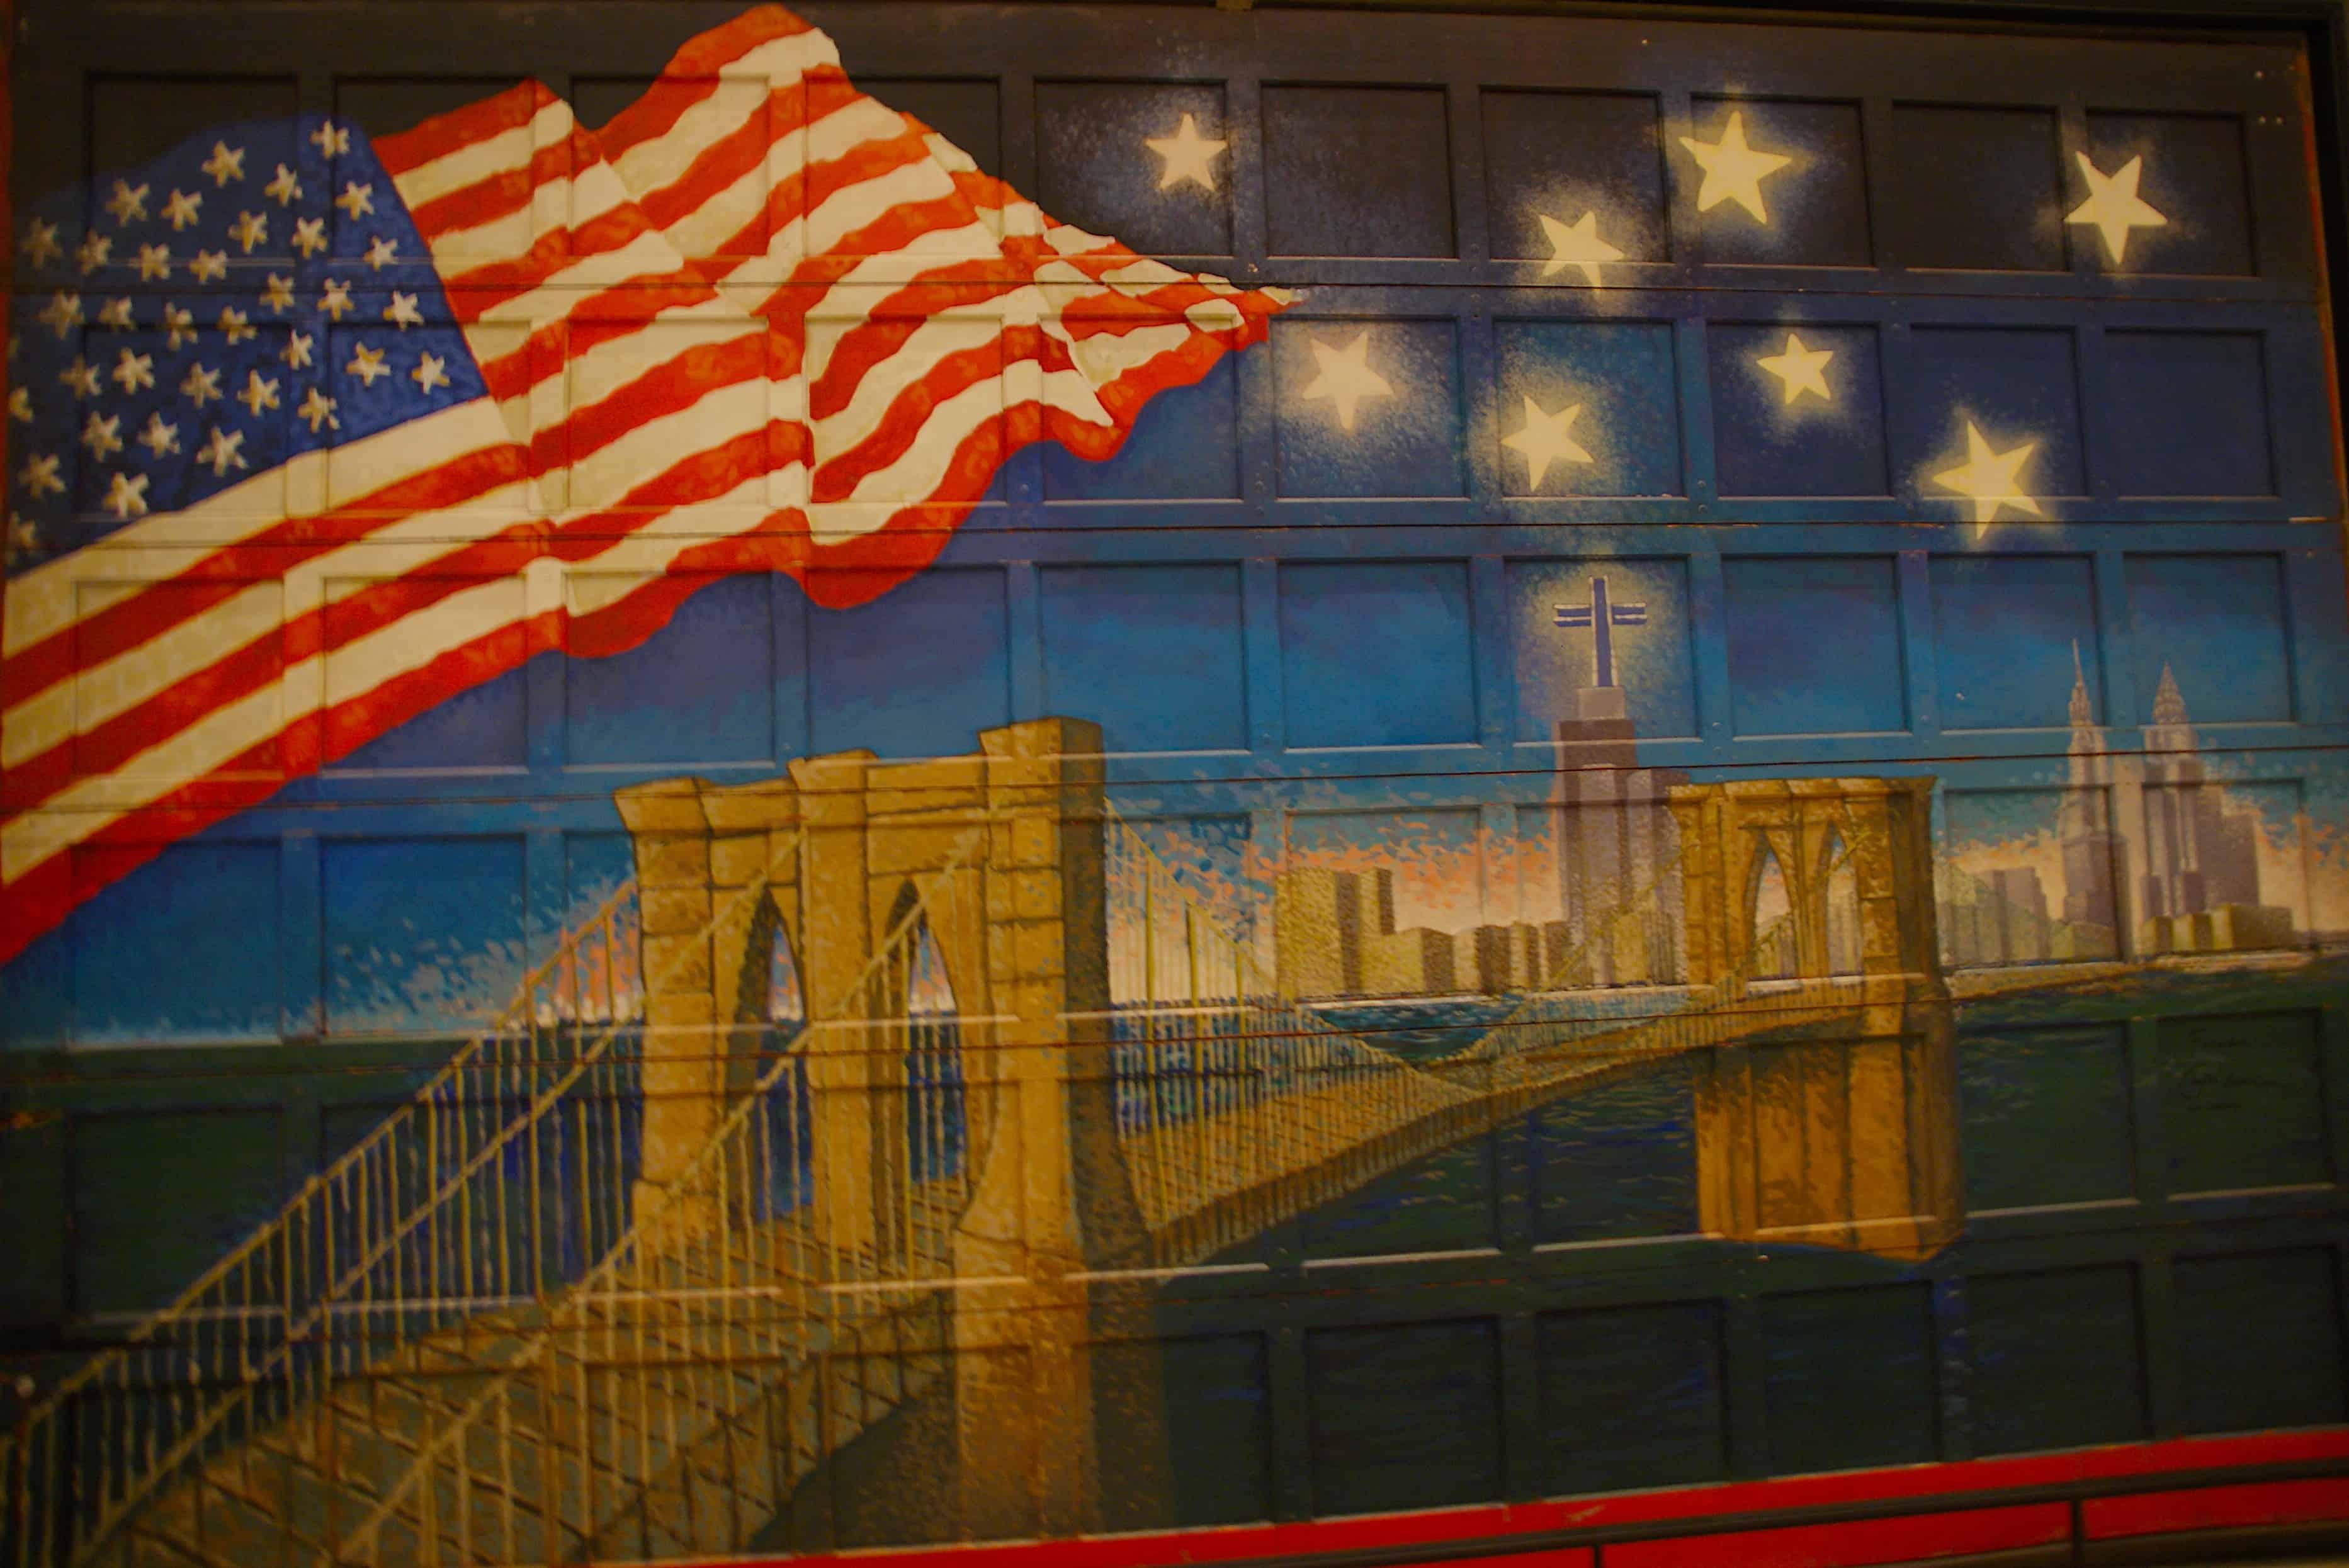 911 Museum Artwork Midtown Manhattan